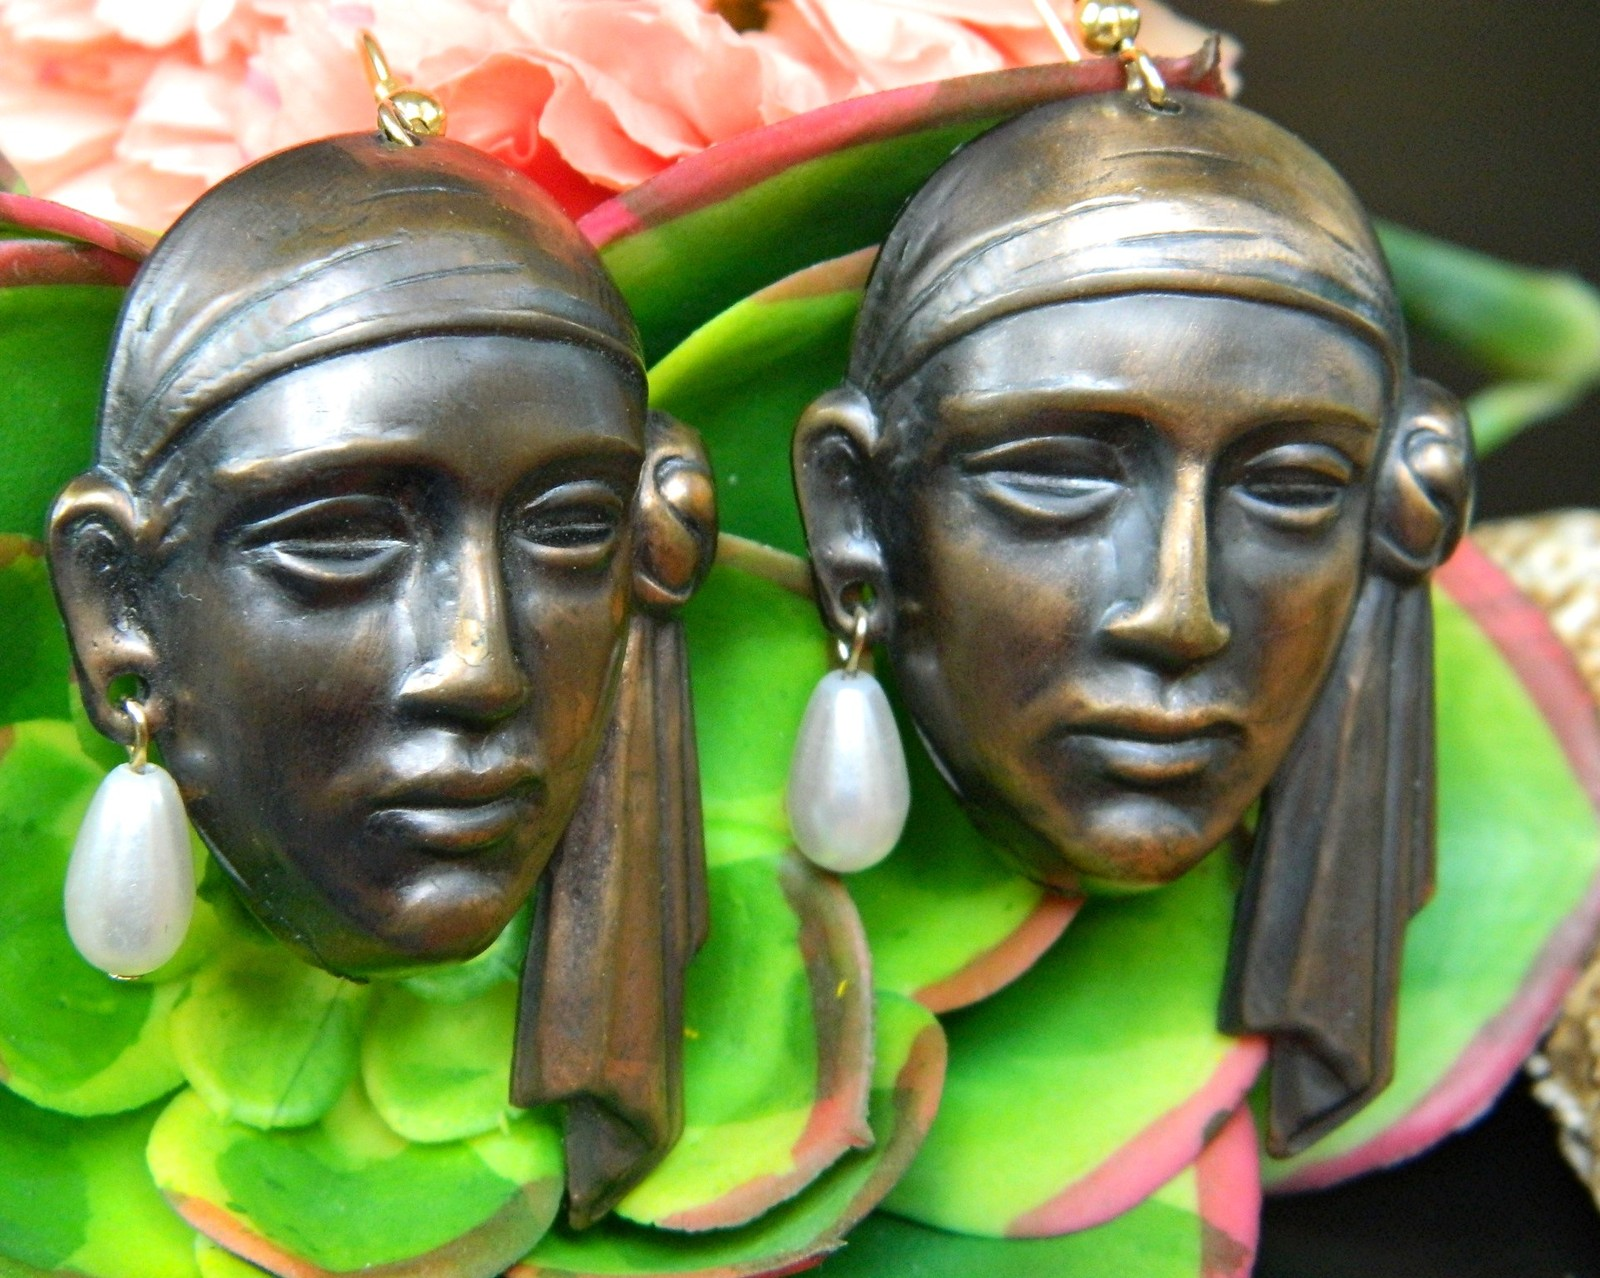 Vintage Pirate Sheik Face Earrings Copper Figural Dangles Faux Pearls